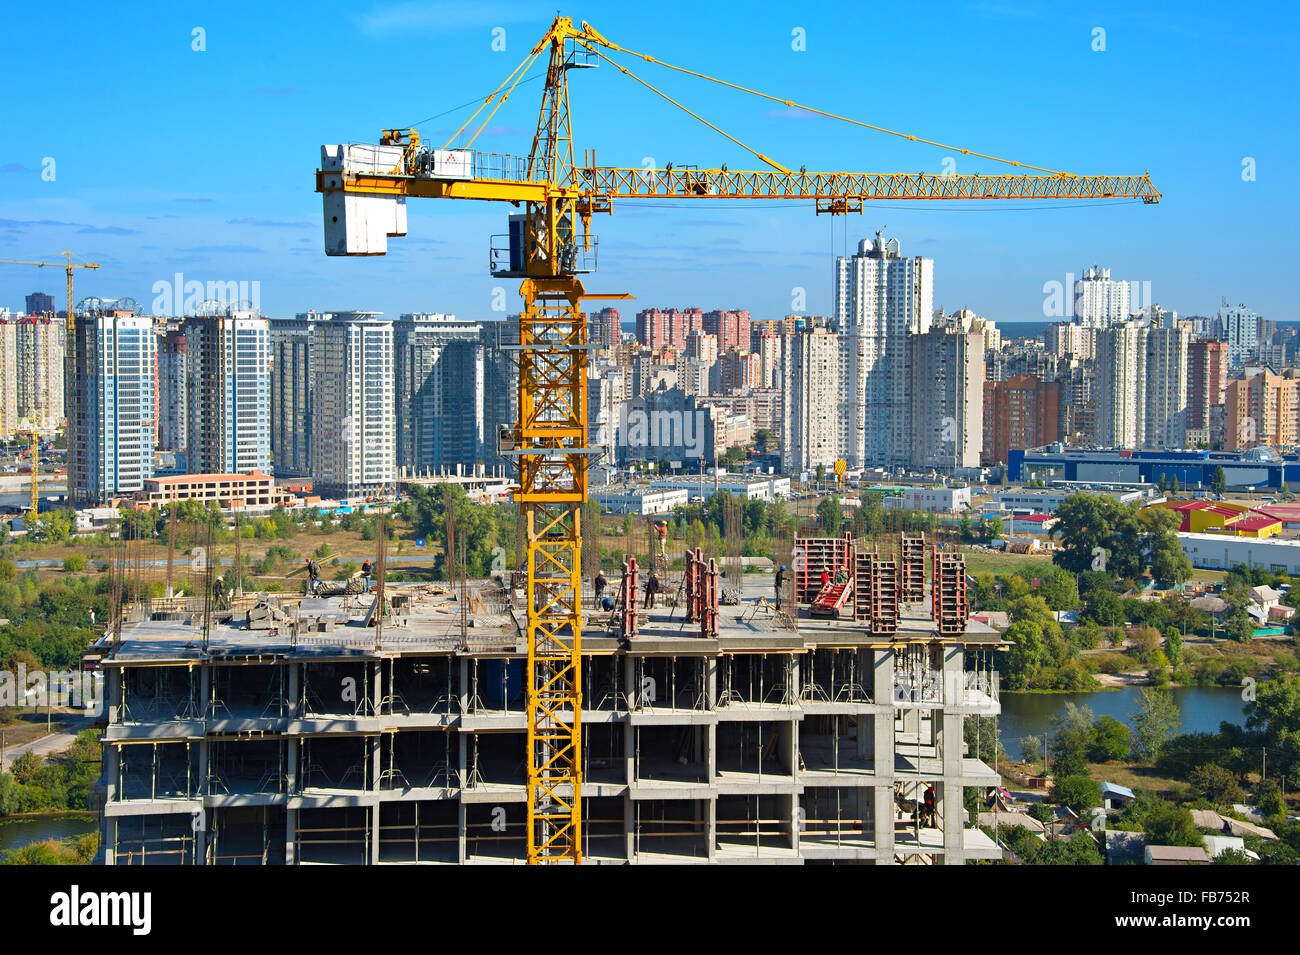 Work in progress at construction site in Kiev, Ukraine - Stock Image